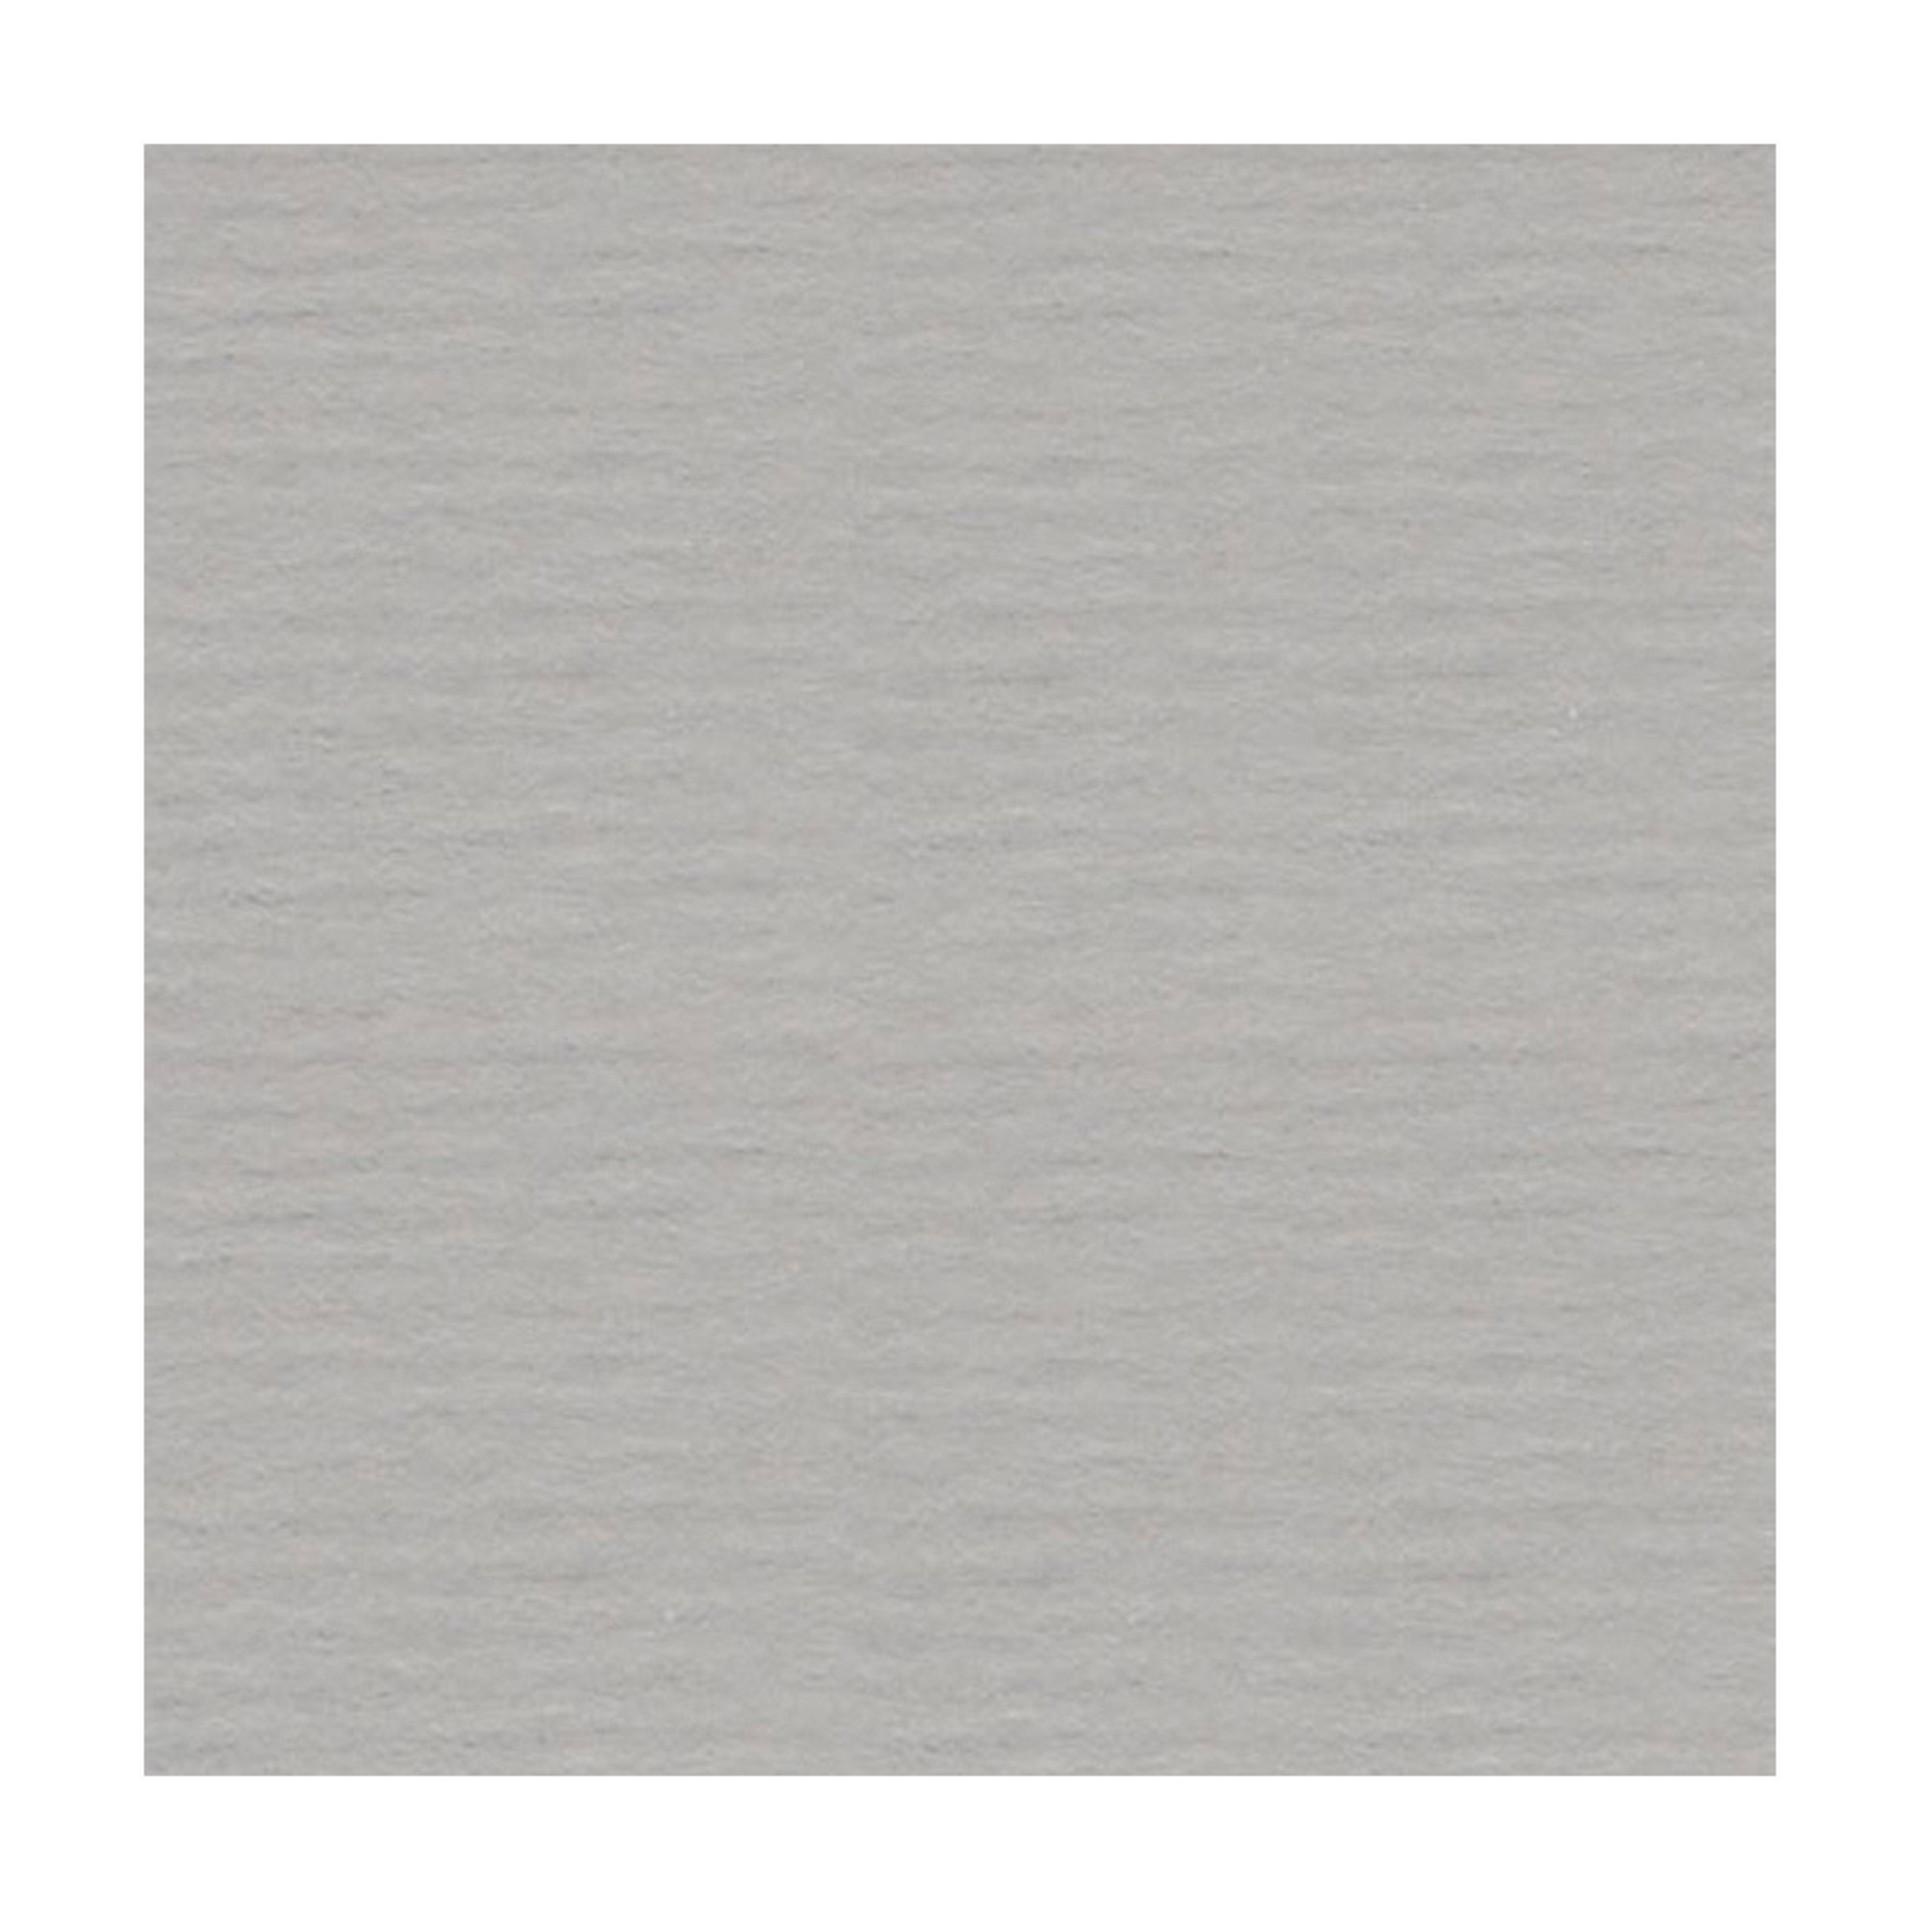 Strathmore Artist Texture Paper Smoke